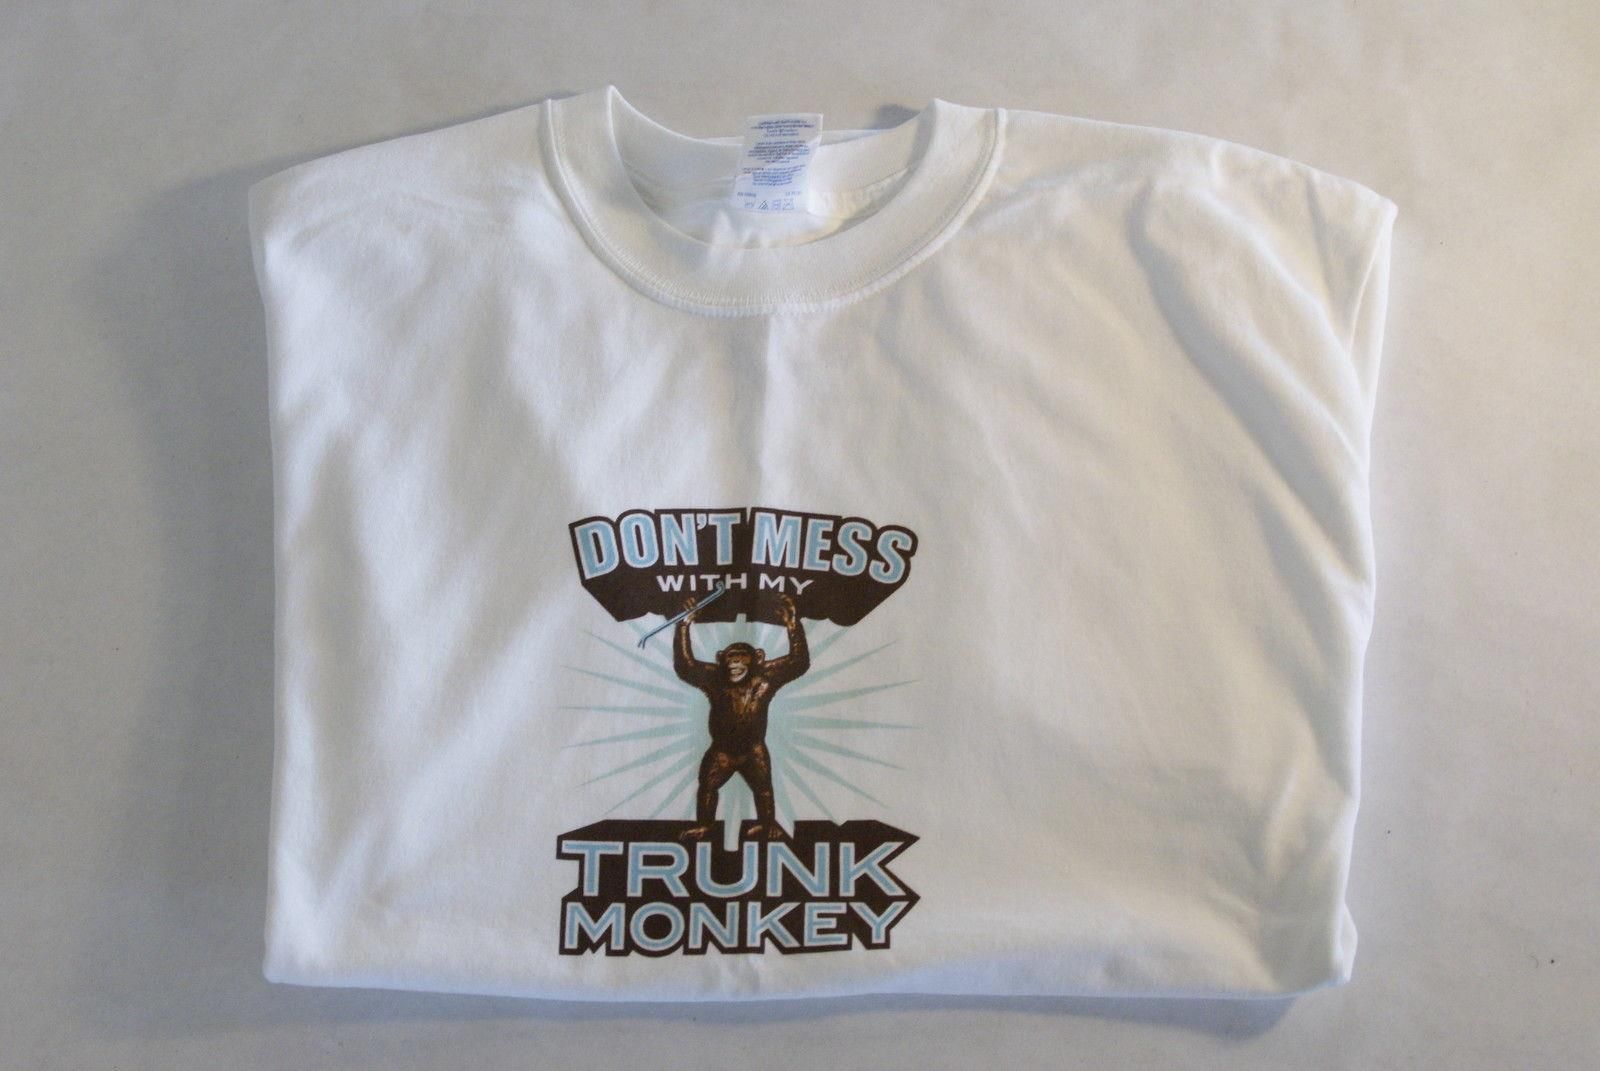 Trunk Monkey T-Shirt - White - GM (WHITE-SHIRT)